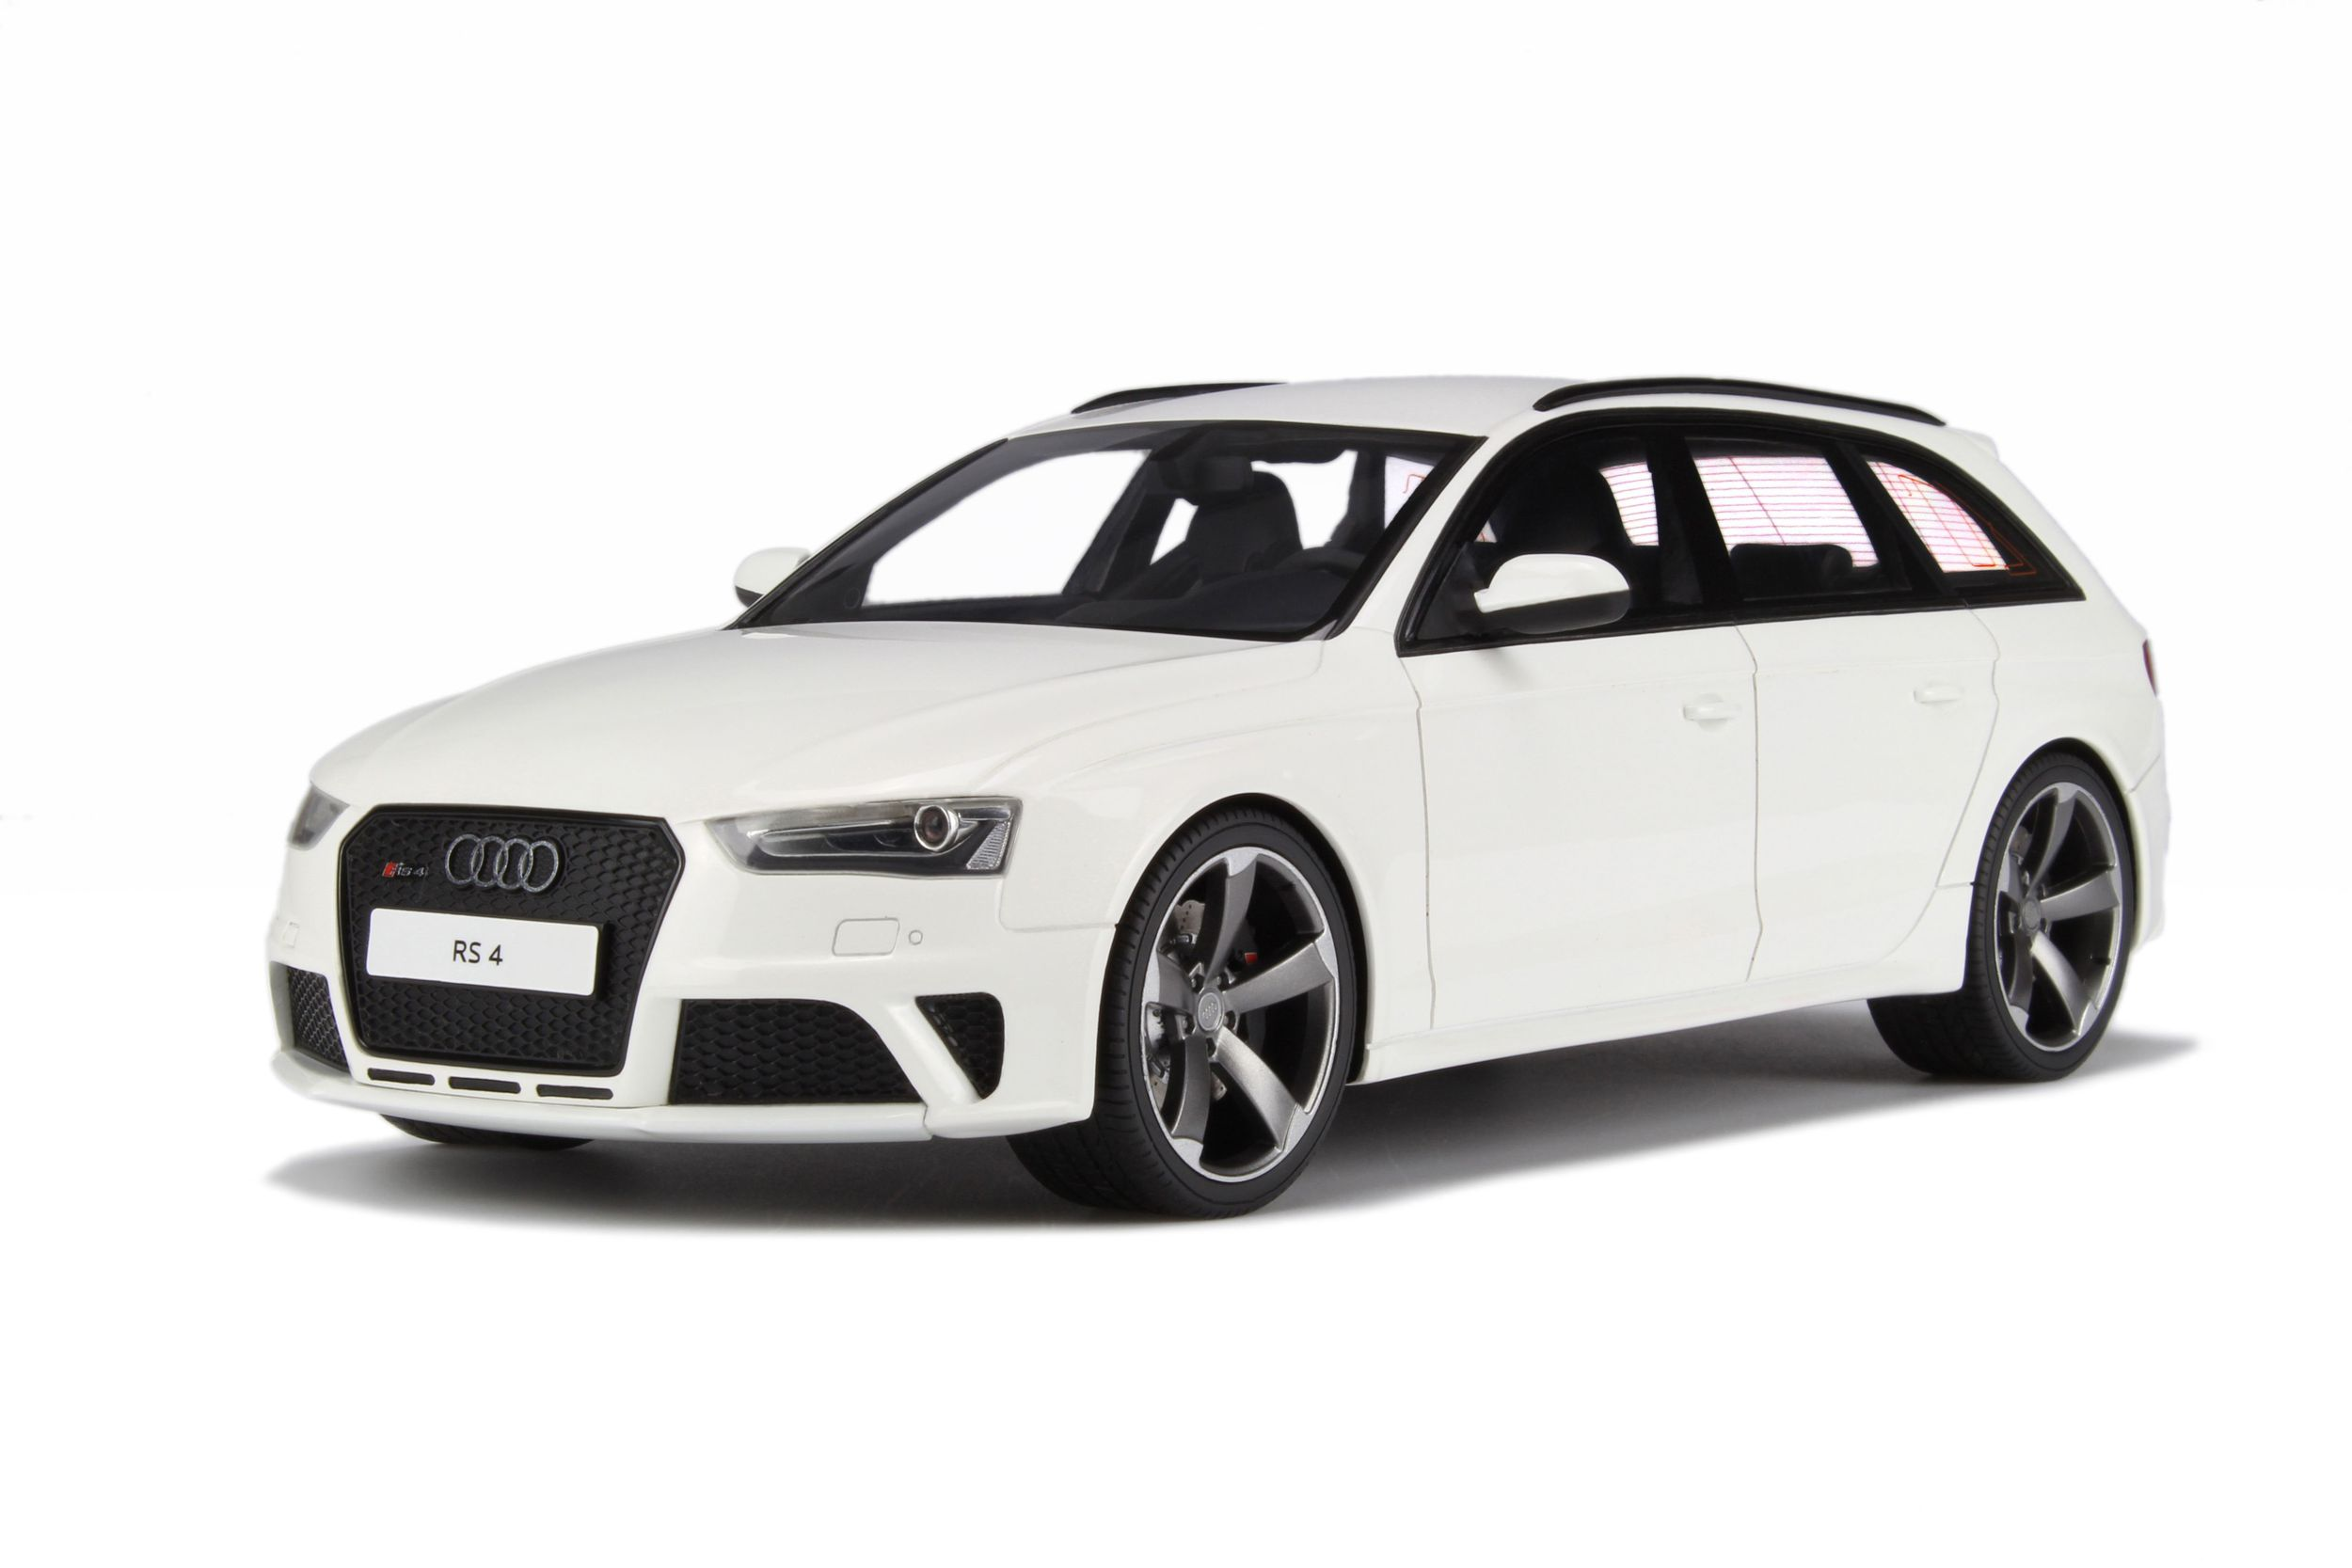 Audi Rs 4 B8 Model Car Collection Gt Spirit